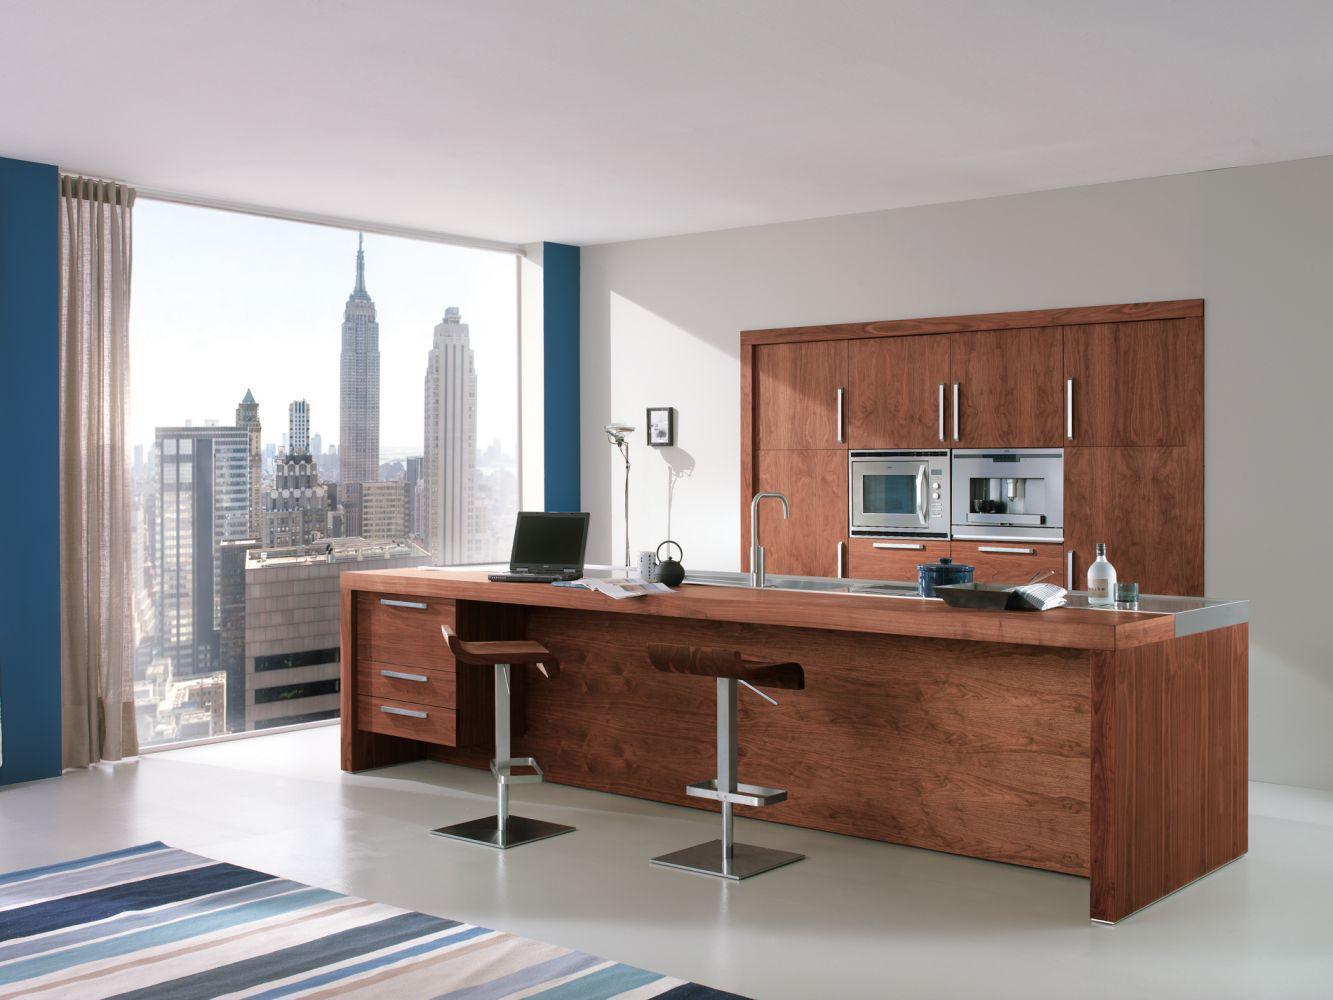 Moderne Küche / Holz / Kochinsel - LIFE - Riva Industria Mobili | {Moderne küchen mit kochinsel holz 75}